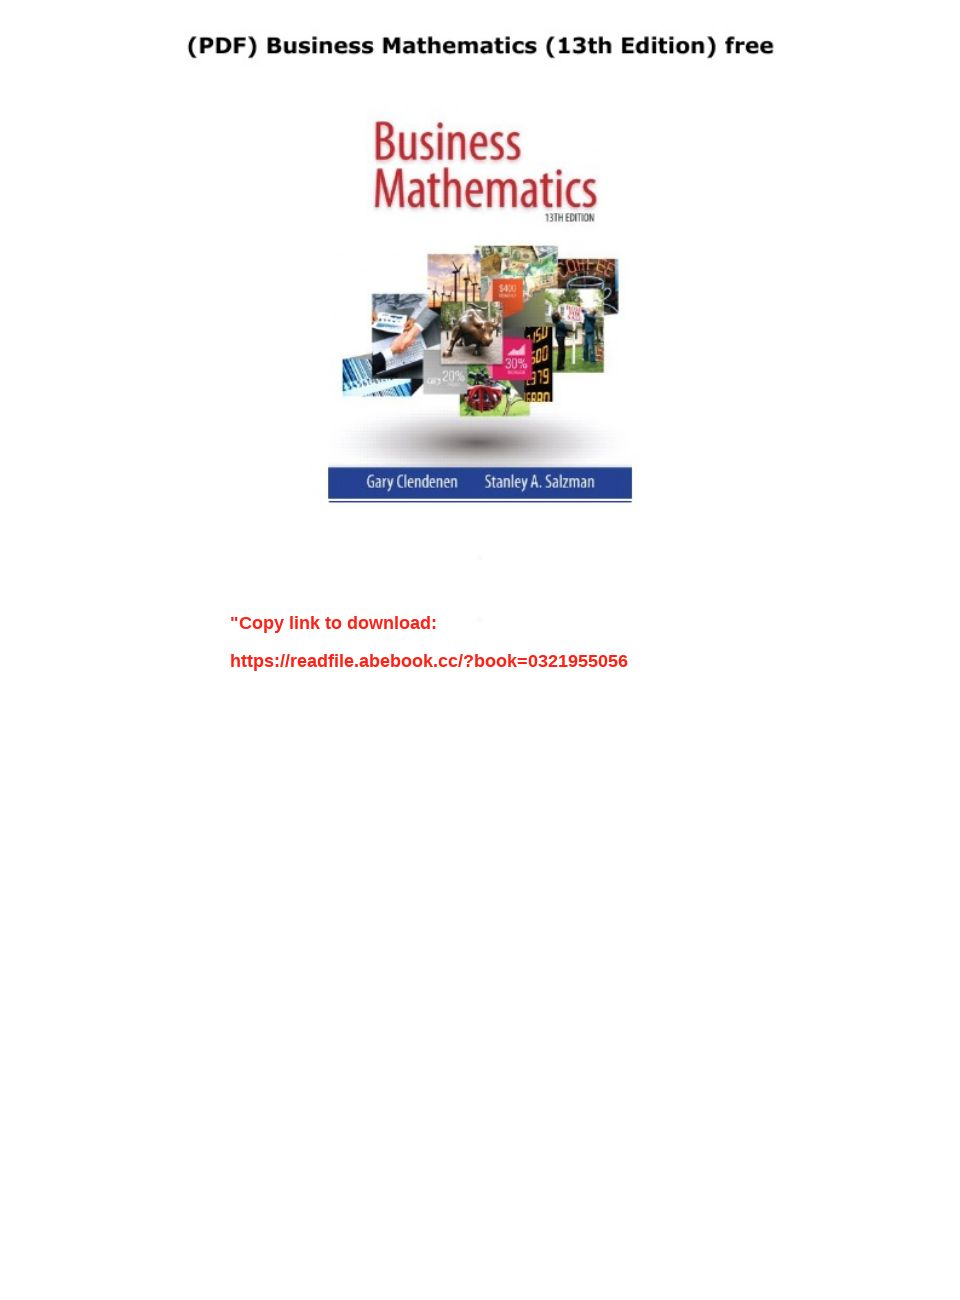 Business Mathematics 13th Edition Pdf Free